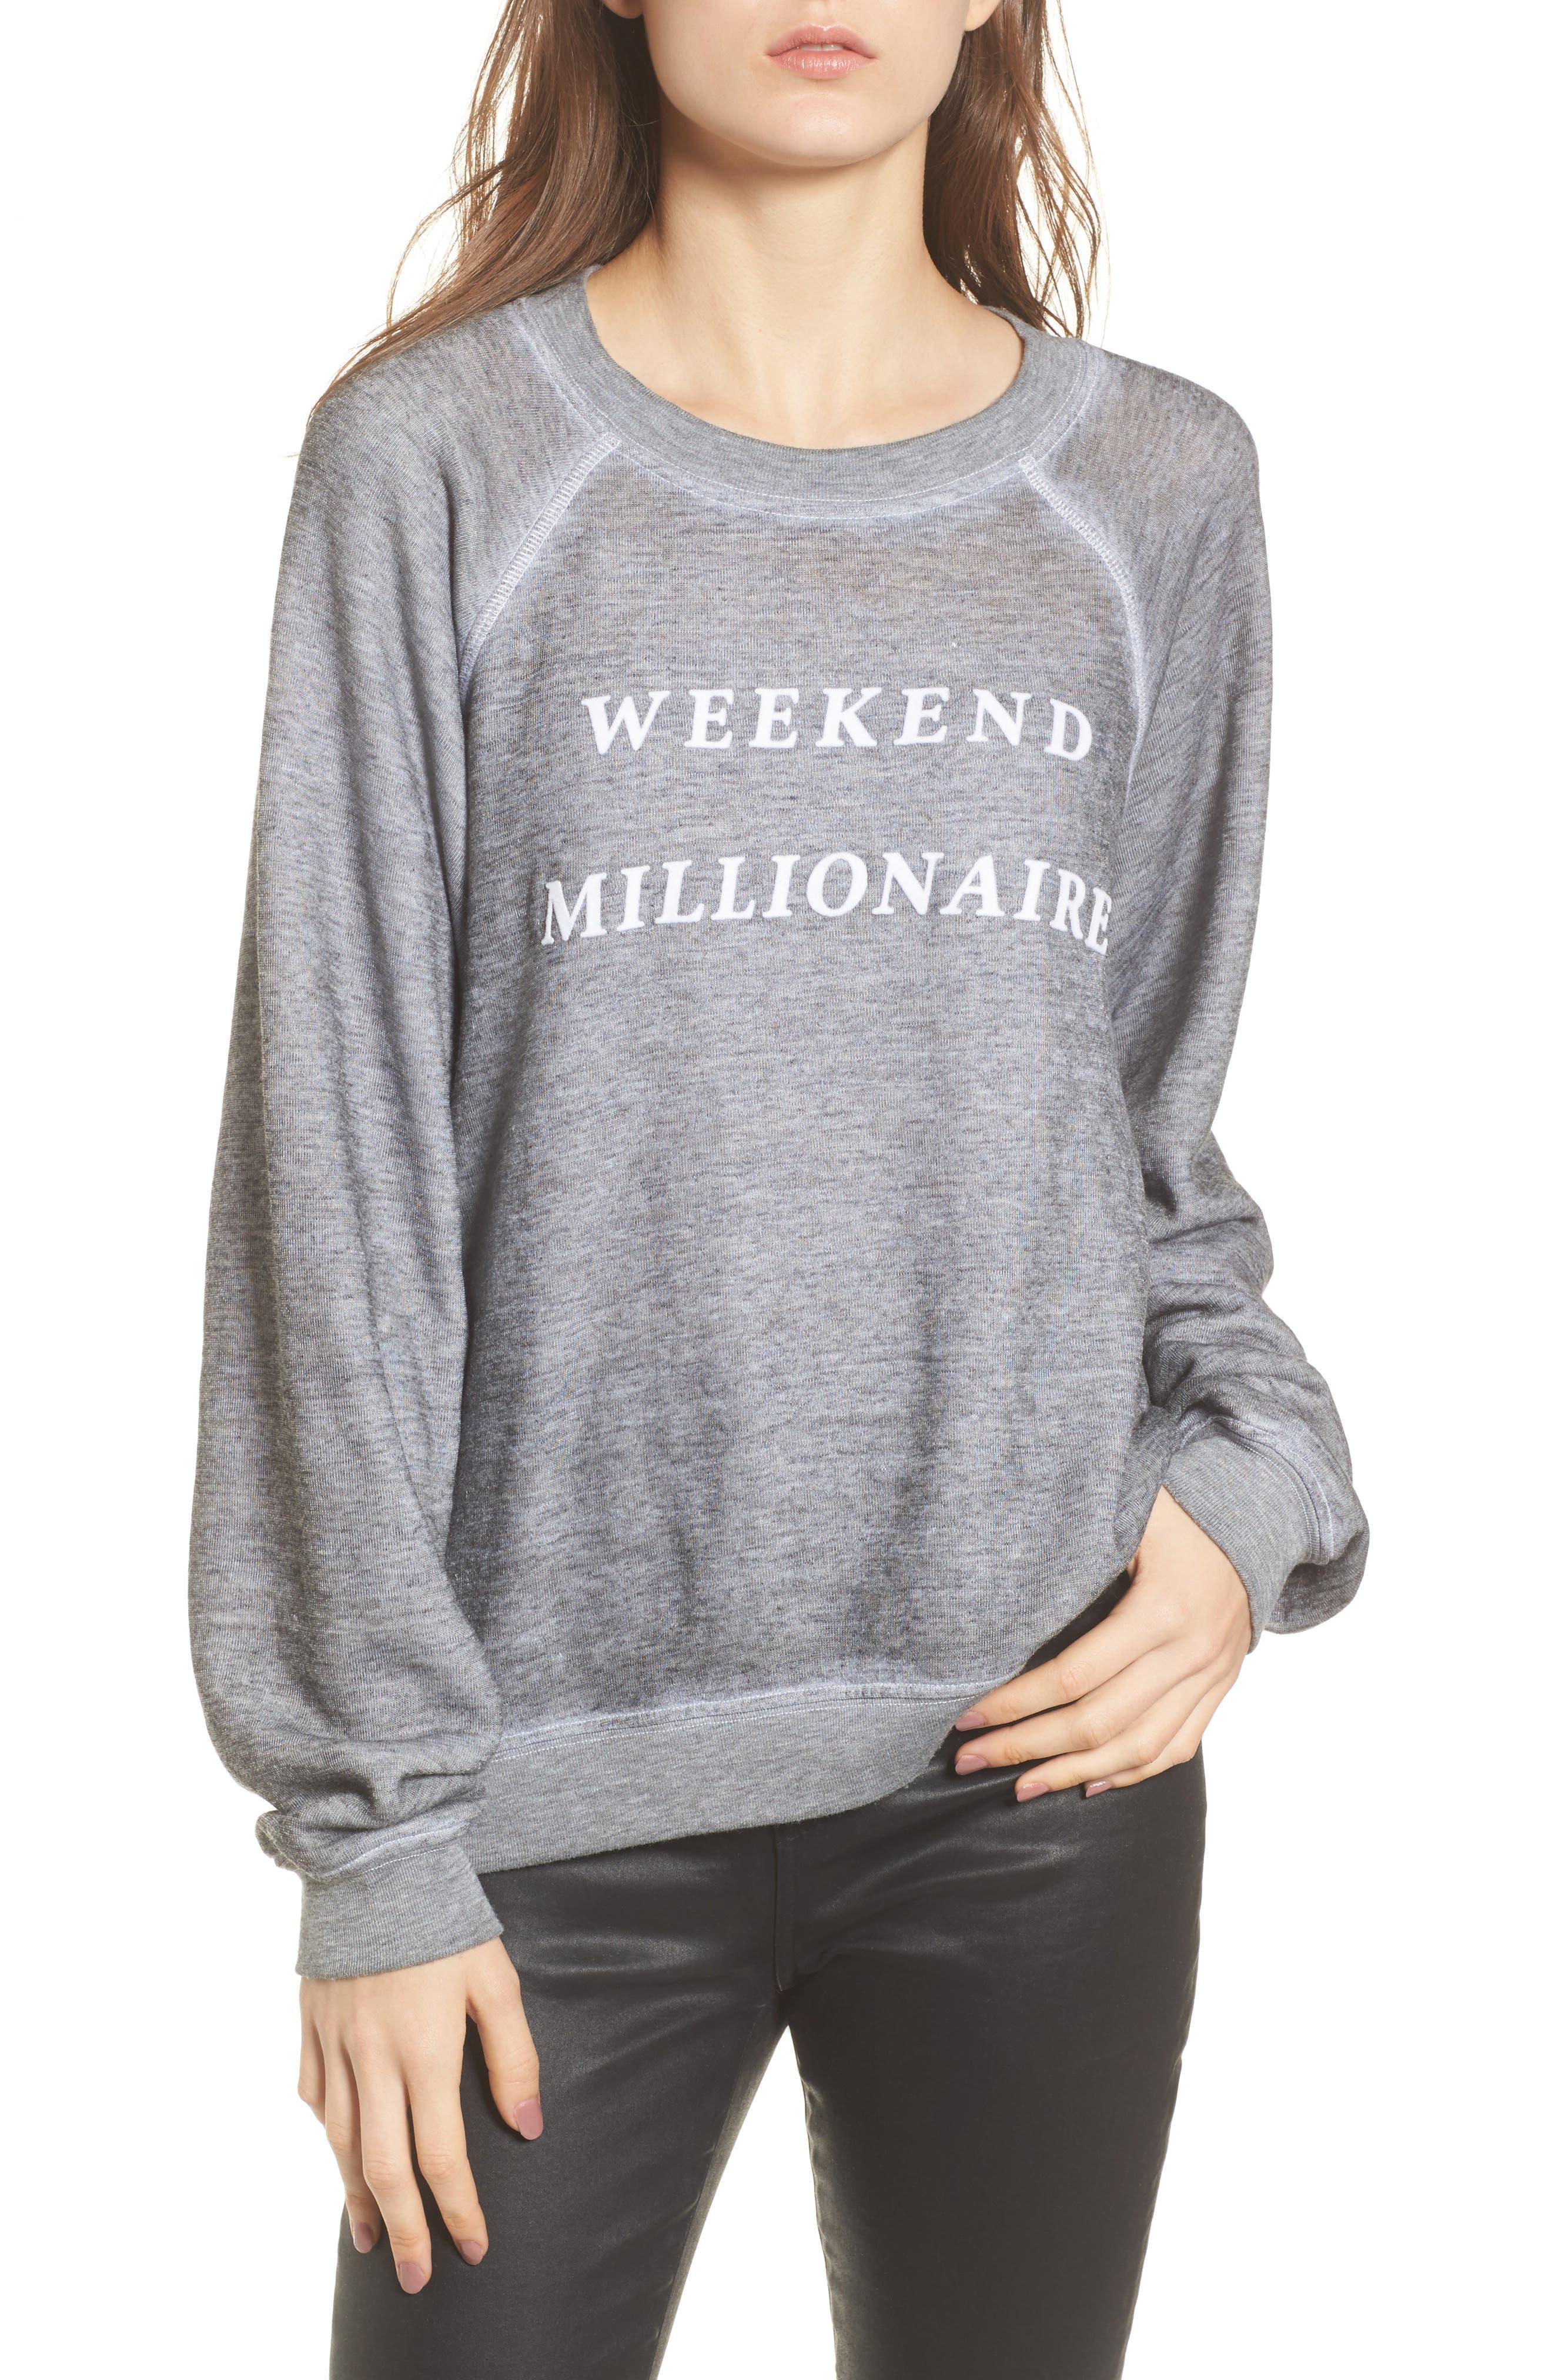 Weekend Millionaire Sweatshirt,                             Main thumbnail 1, color,                             020